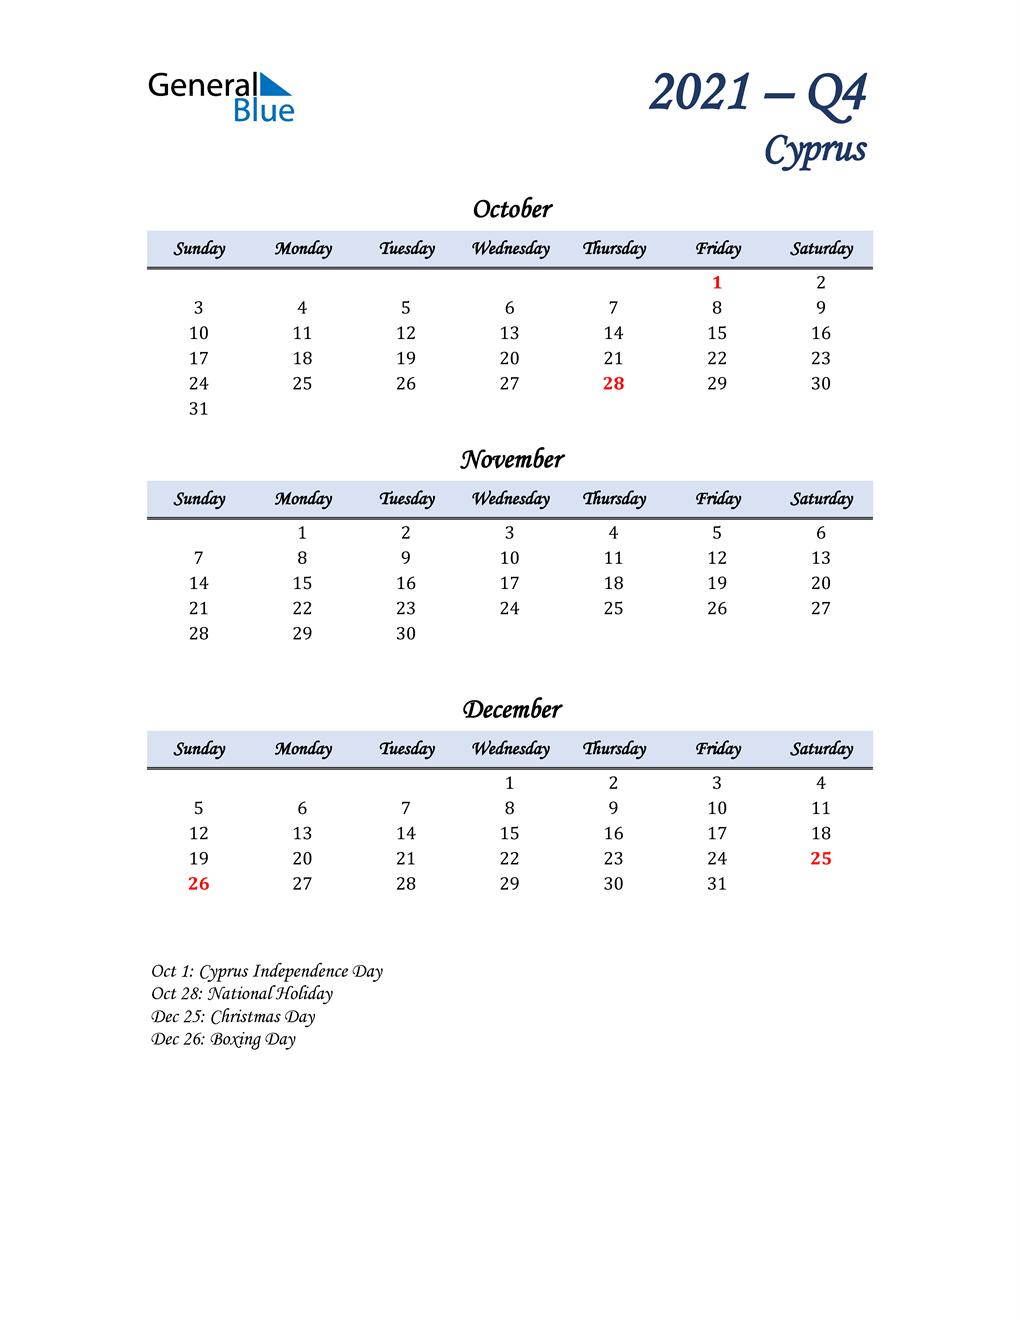 October, November, and December Calendar for Cyprus